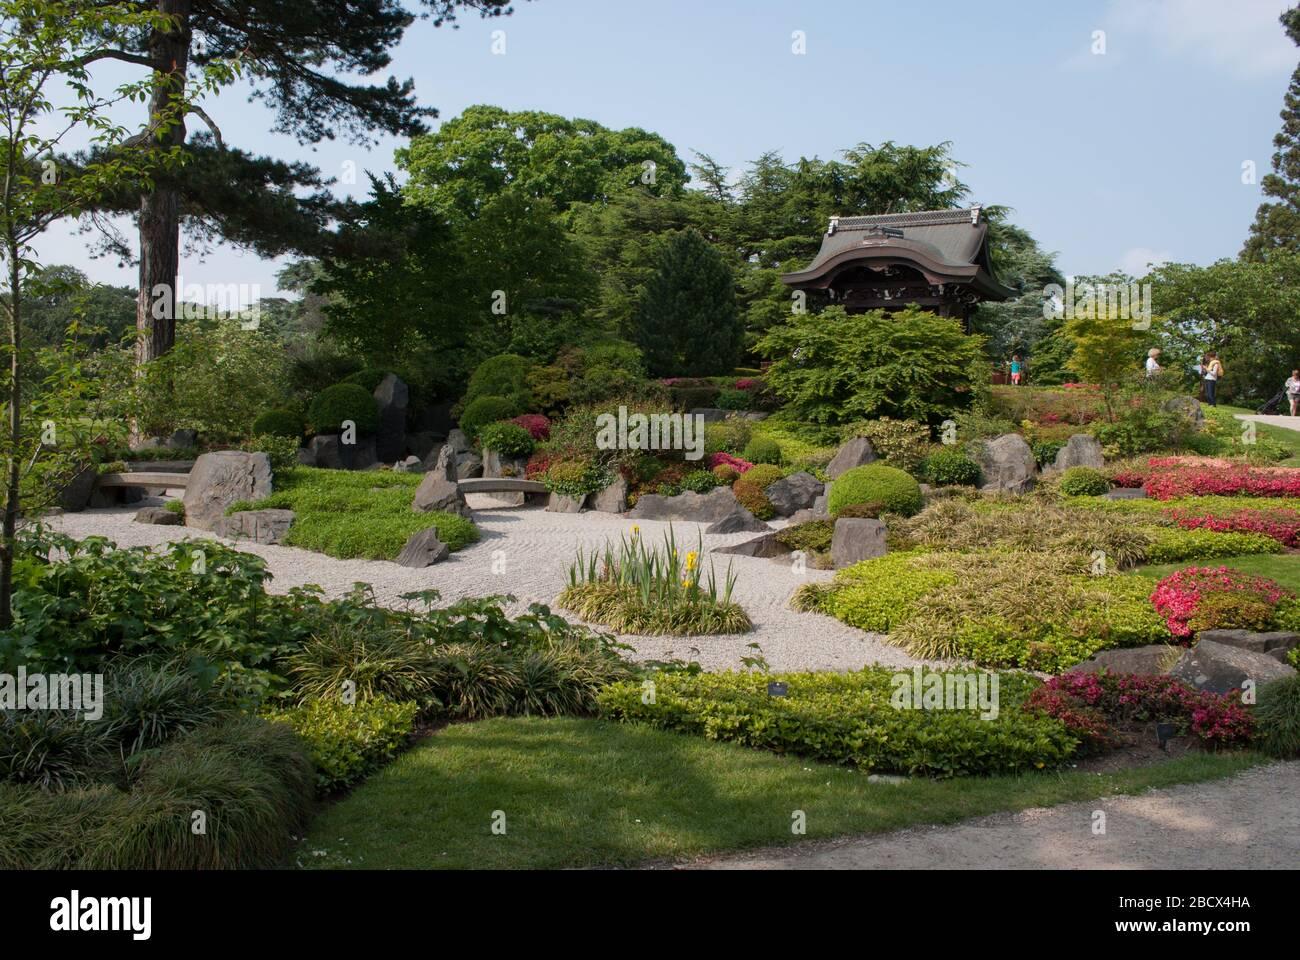 japanese garden royal botanic gardens kew gardens richmond london tw9 3ae 2BCX4HA - Kew Gardens Royal Botanic Gardens Kew Richmond Surrey Tw9 3ae